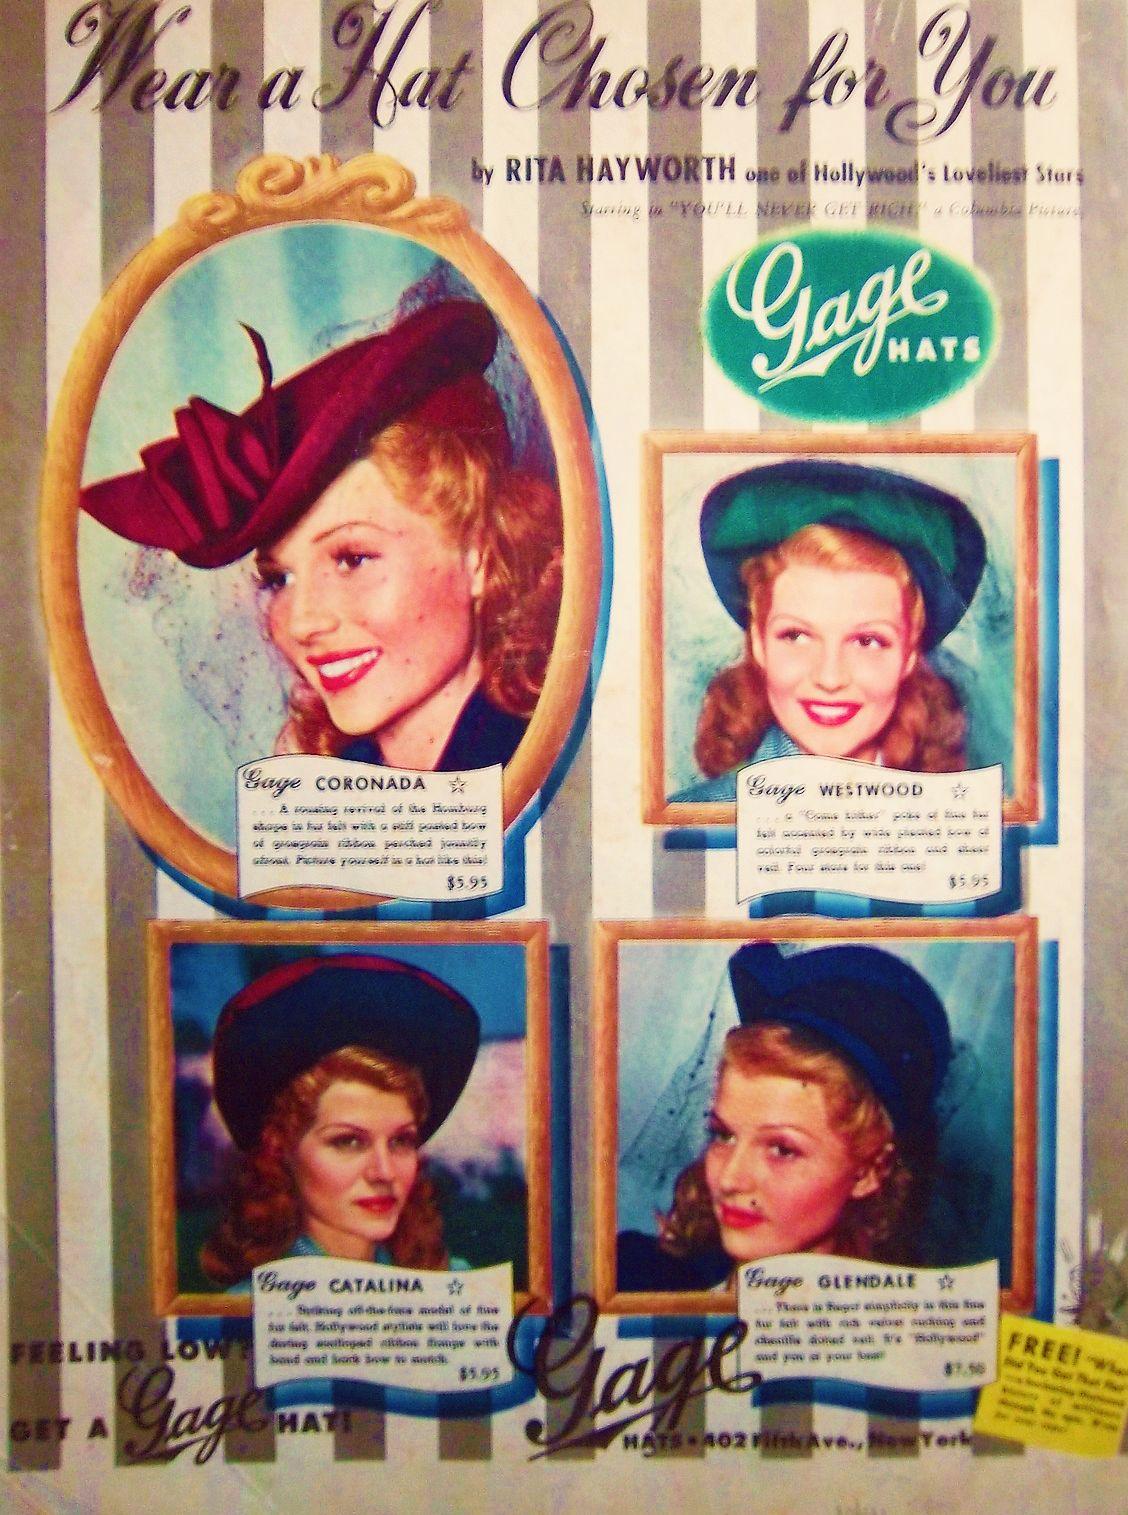 20/30 Rita Hayworth ads: Rita advertising various hats in 1941.